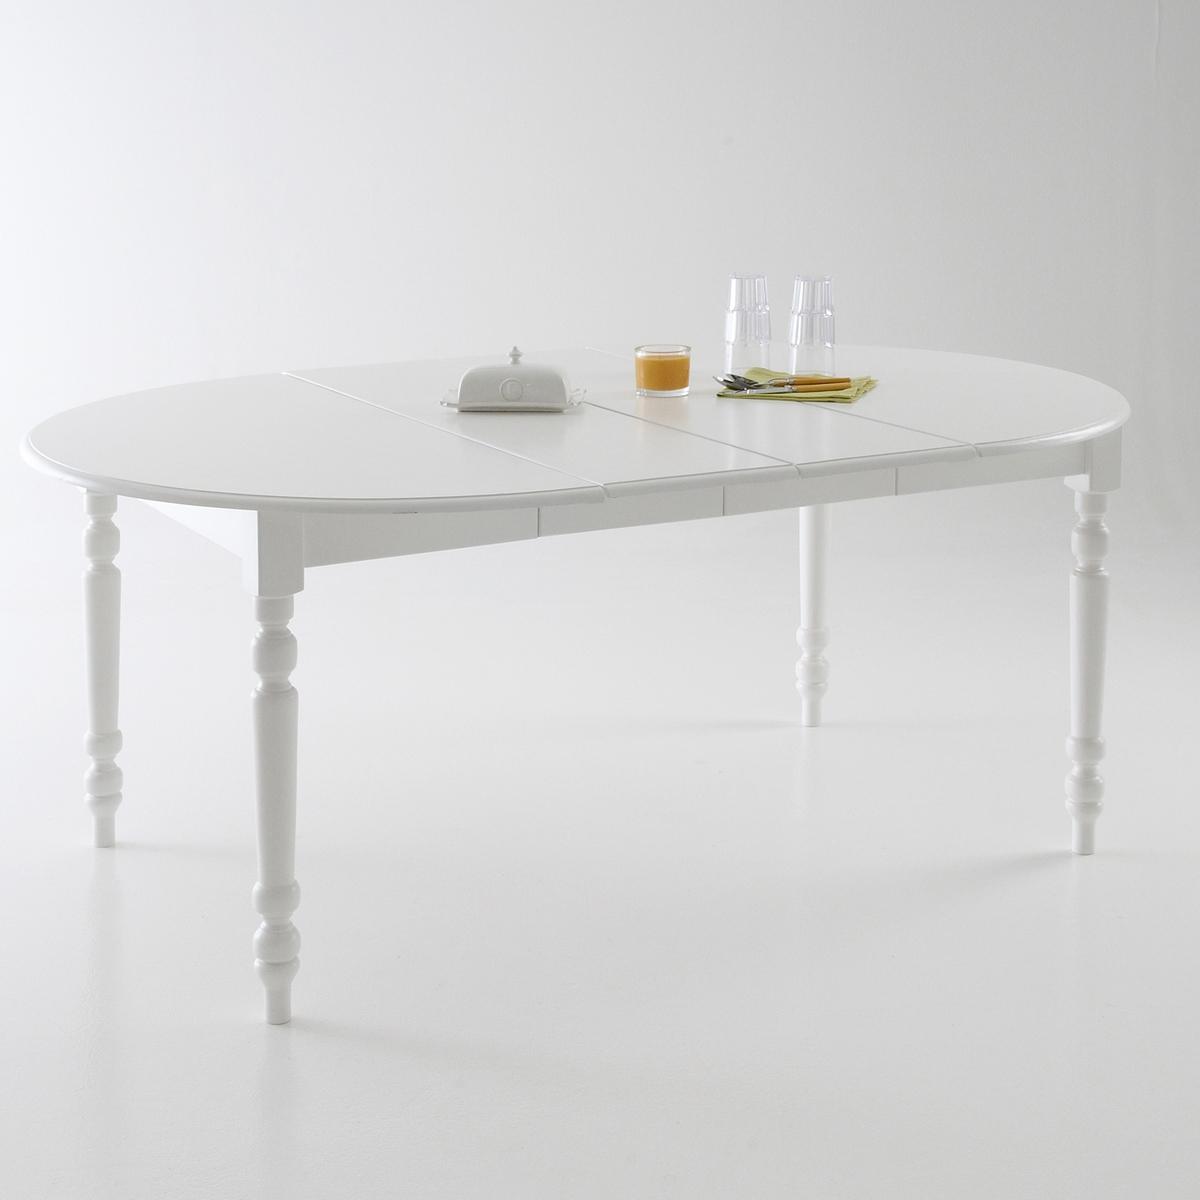 Круглый La Redoute Стол на - персон Authentic Style 8 персоны белый